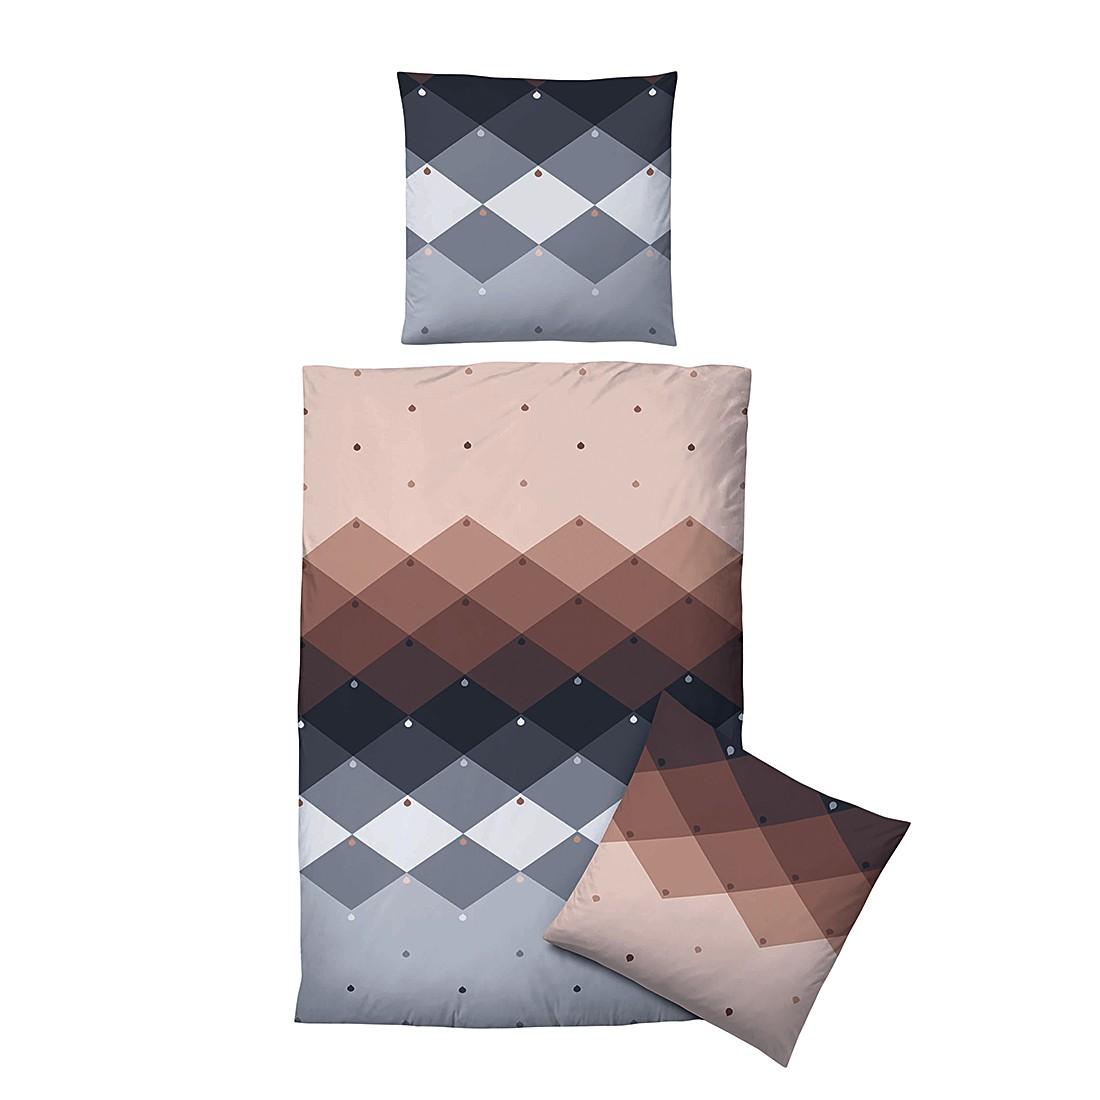 Winter-Soft-Seersucker Bettwäsche Charlotte – 135 x 200 cm + Kissen 80 x 80 cm, Biberna günstig bestellen